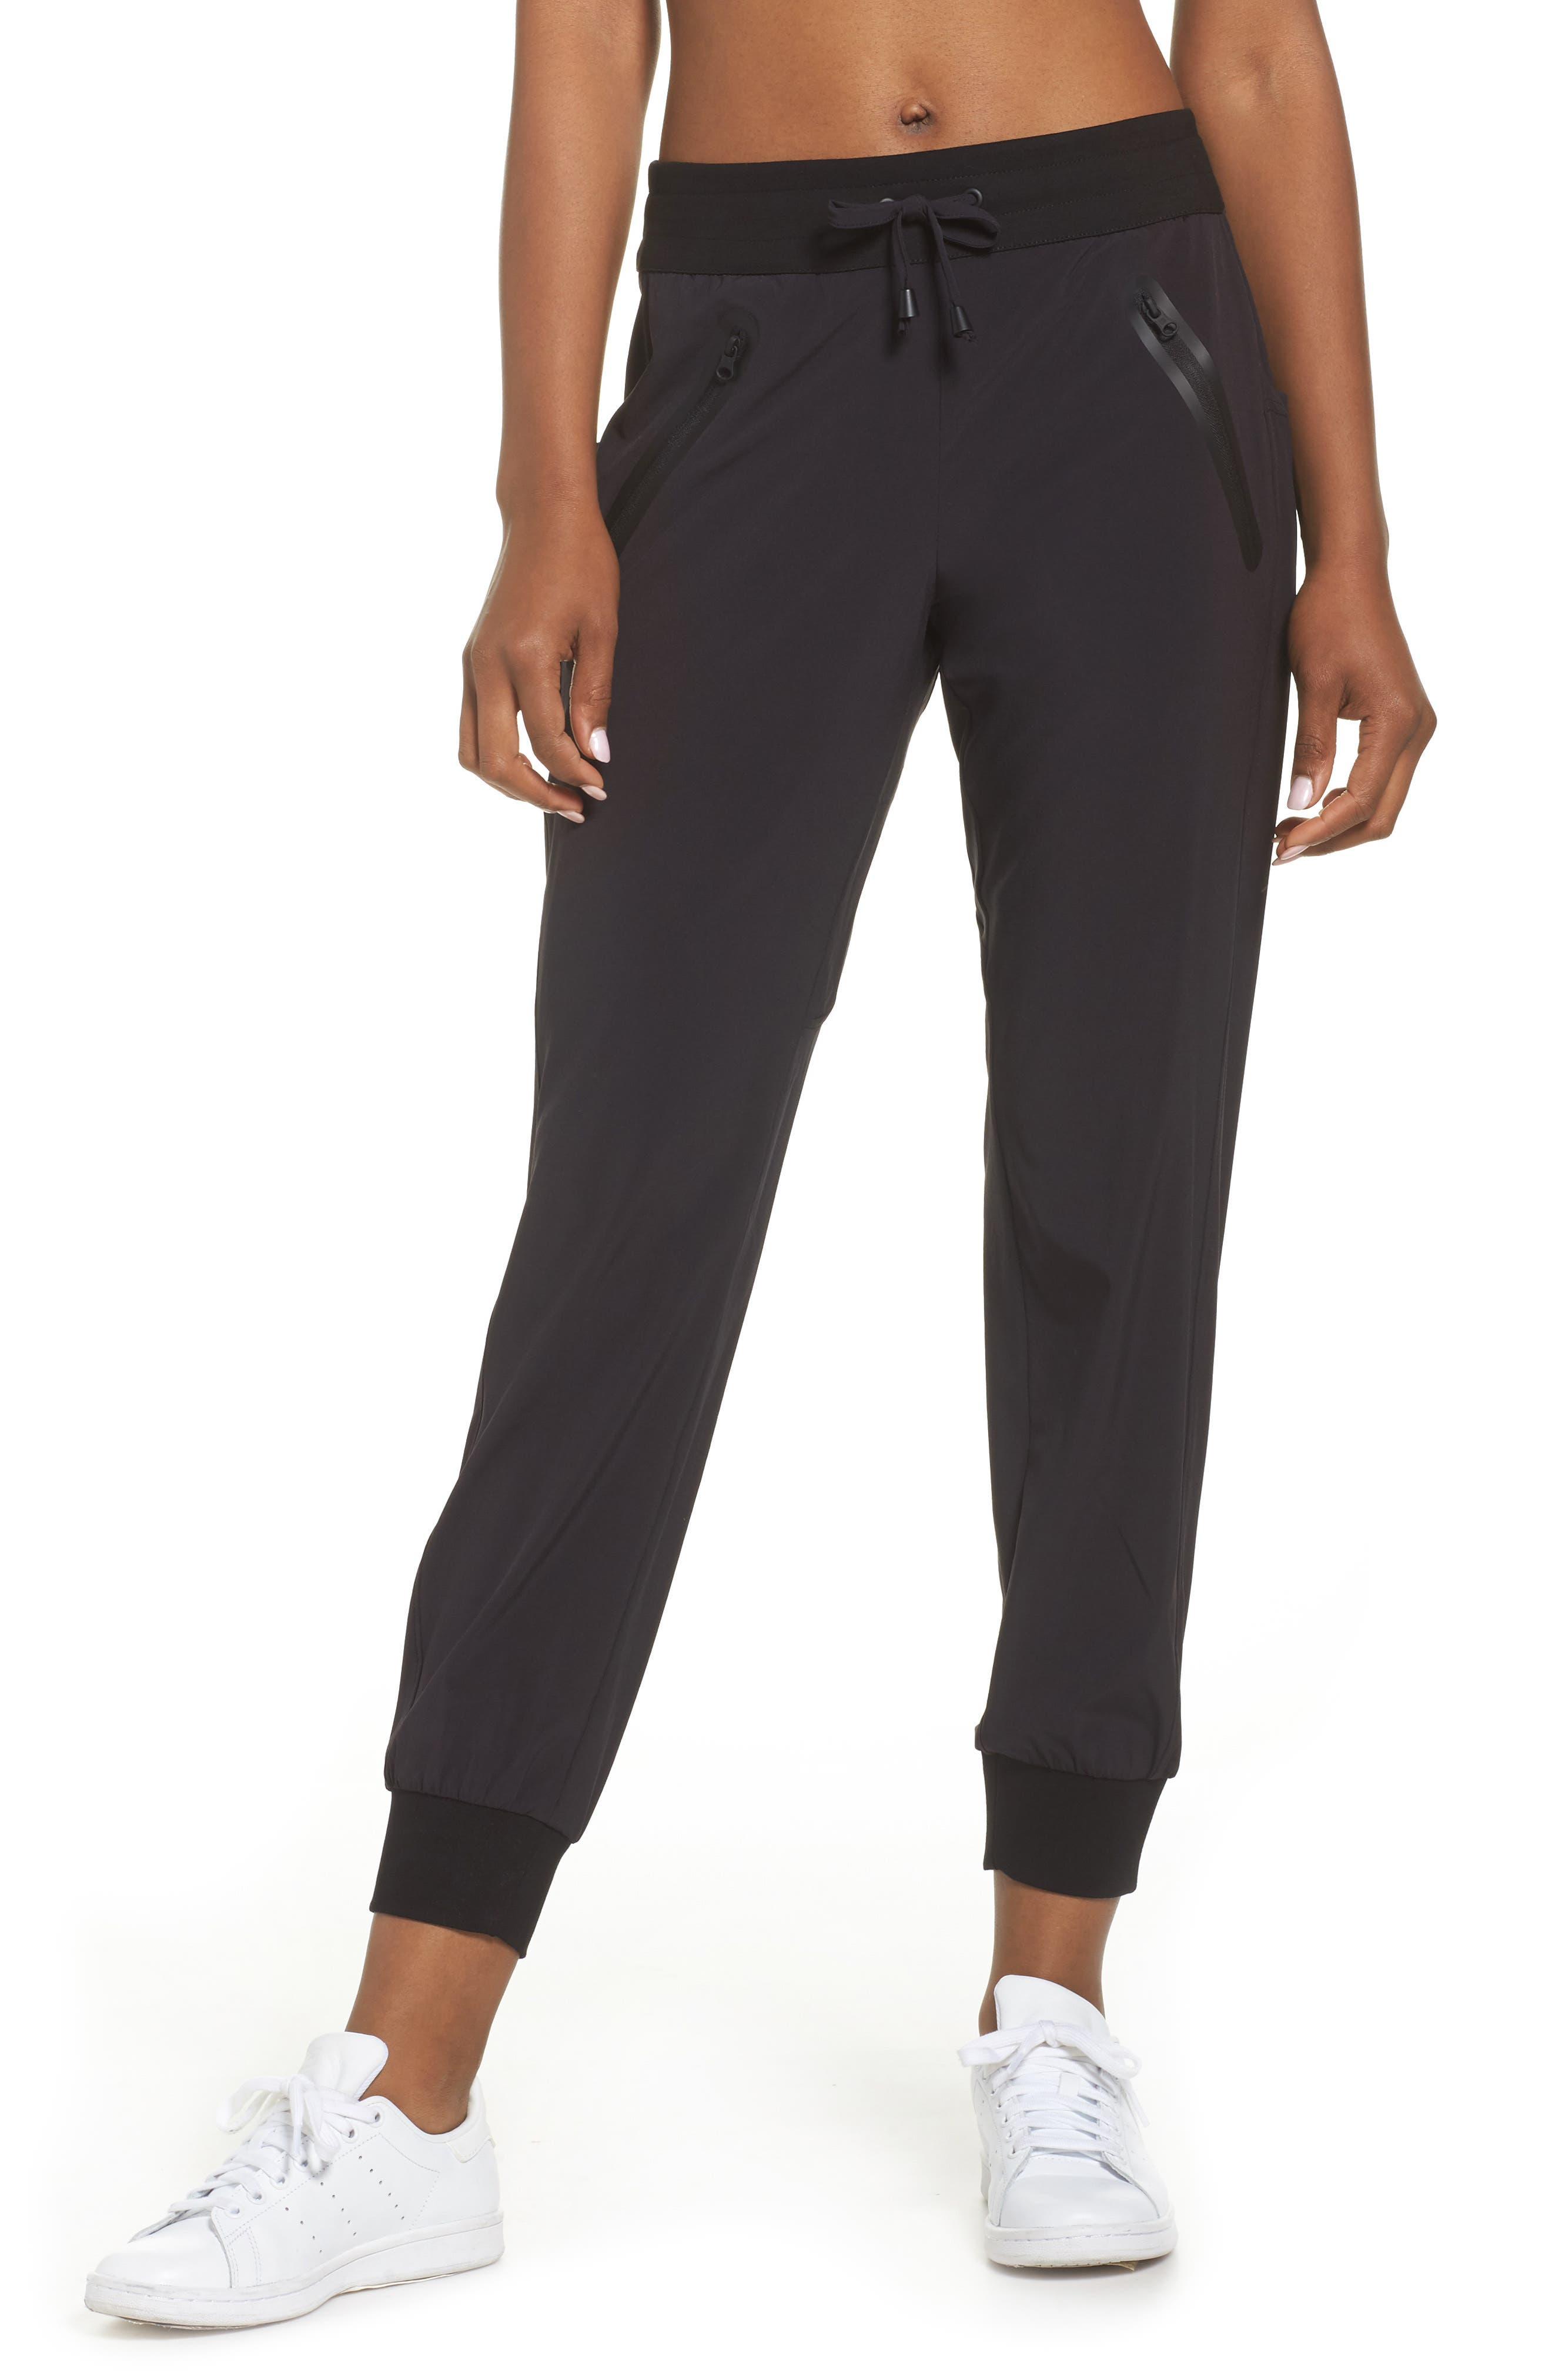 BLANC NOIR Getaway Jogger Pants, Main, color, BLACK